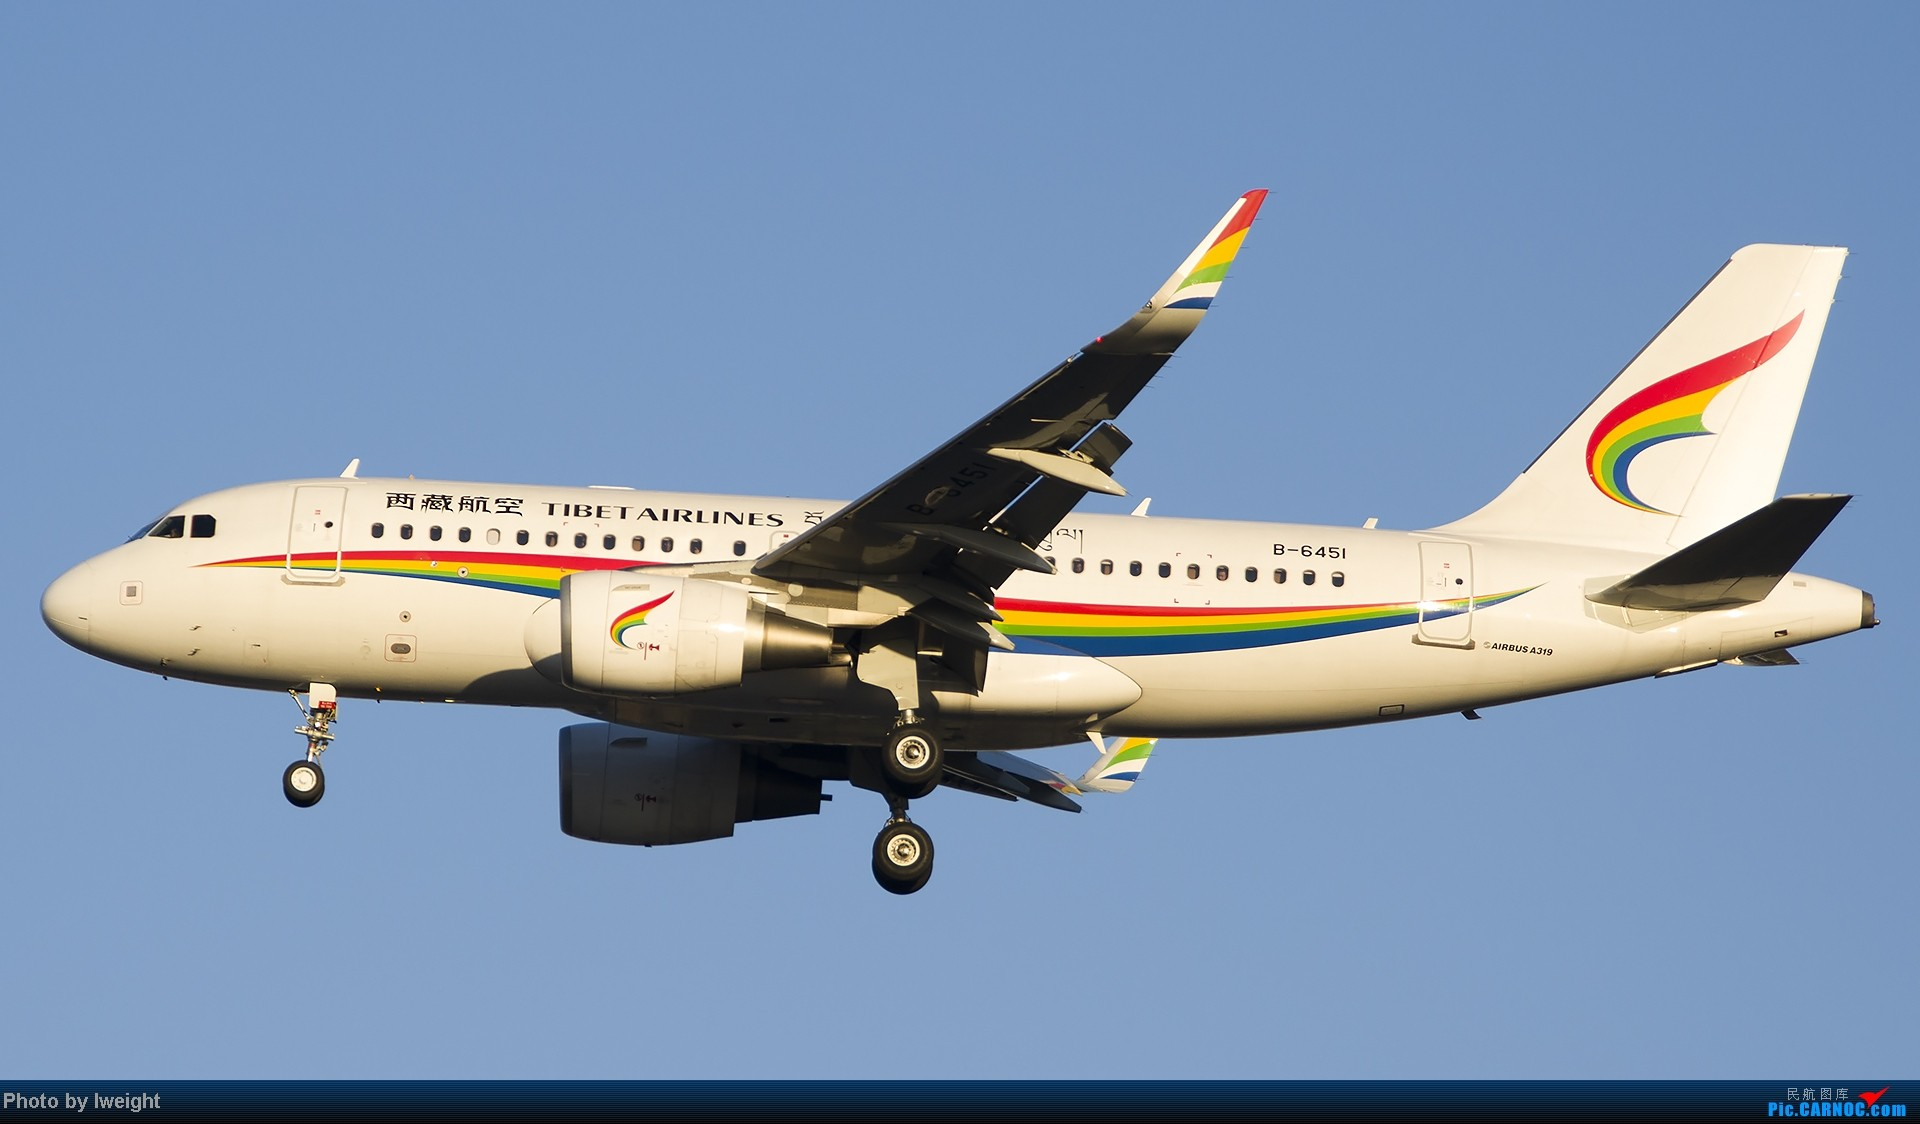 Re:[原创]抓住APEC蓝的尾巴,再拍上一组 AIRBUS A319-100 B-6451 中国北京首都机场